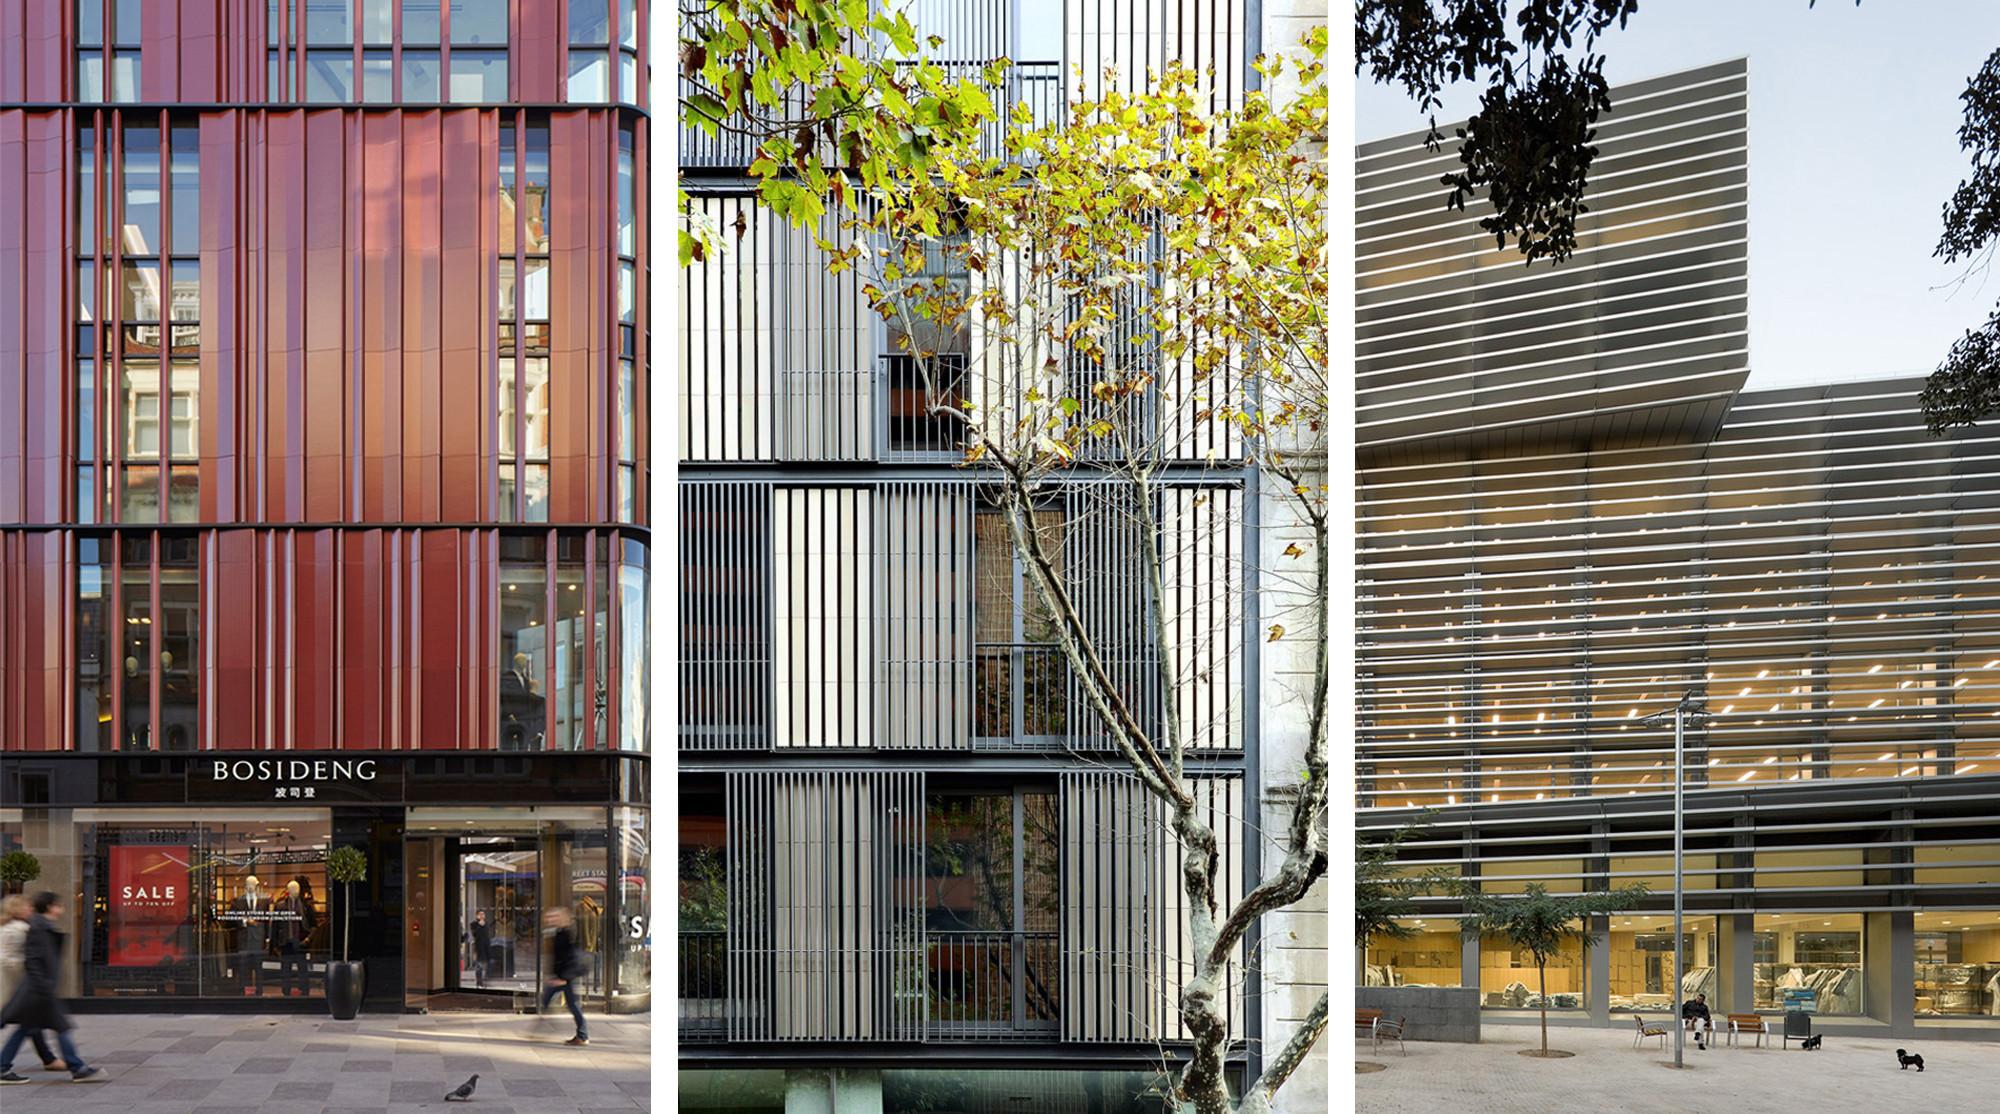 Edificios protecci n solar en fachadas plataforma - Fachadas arquitectura ...